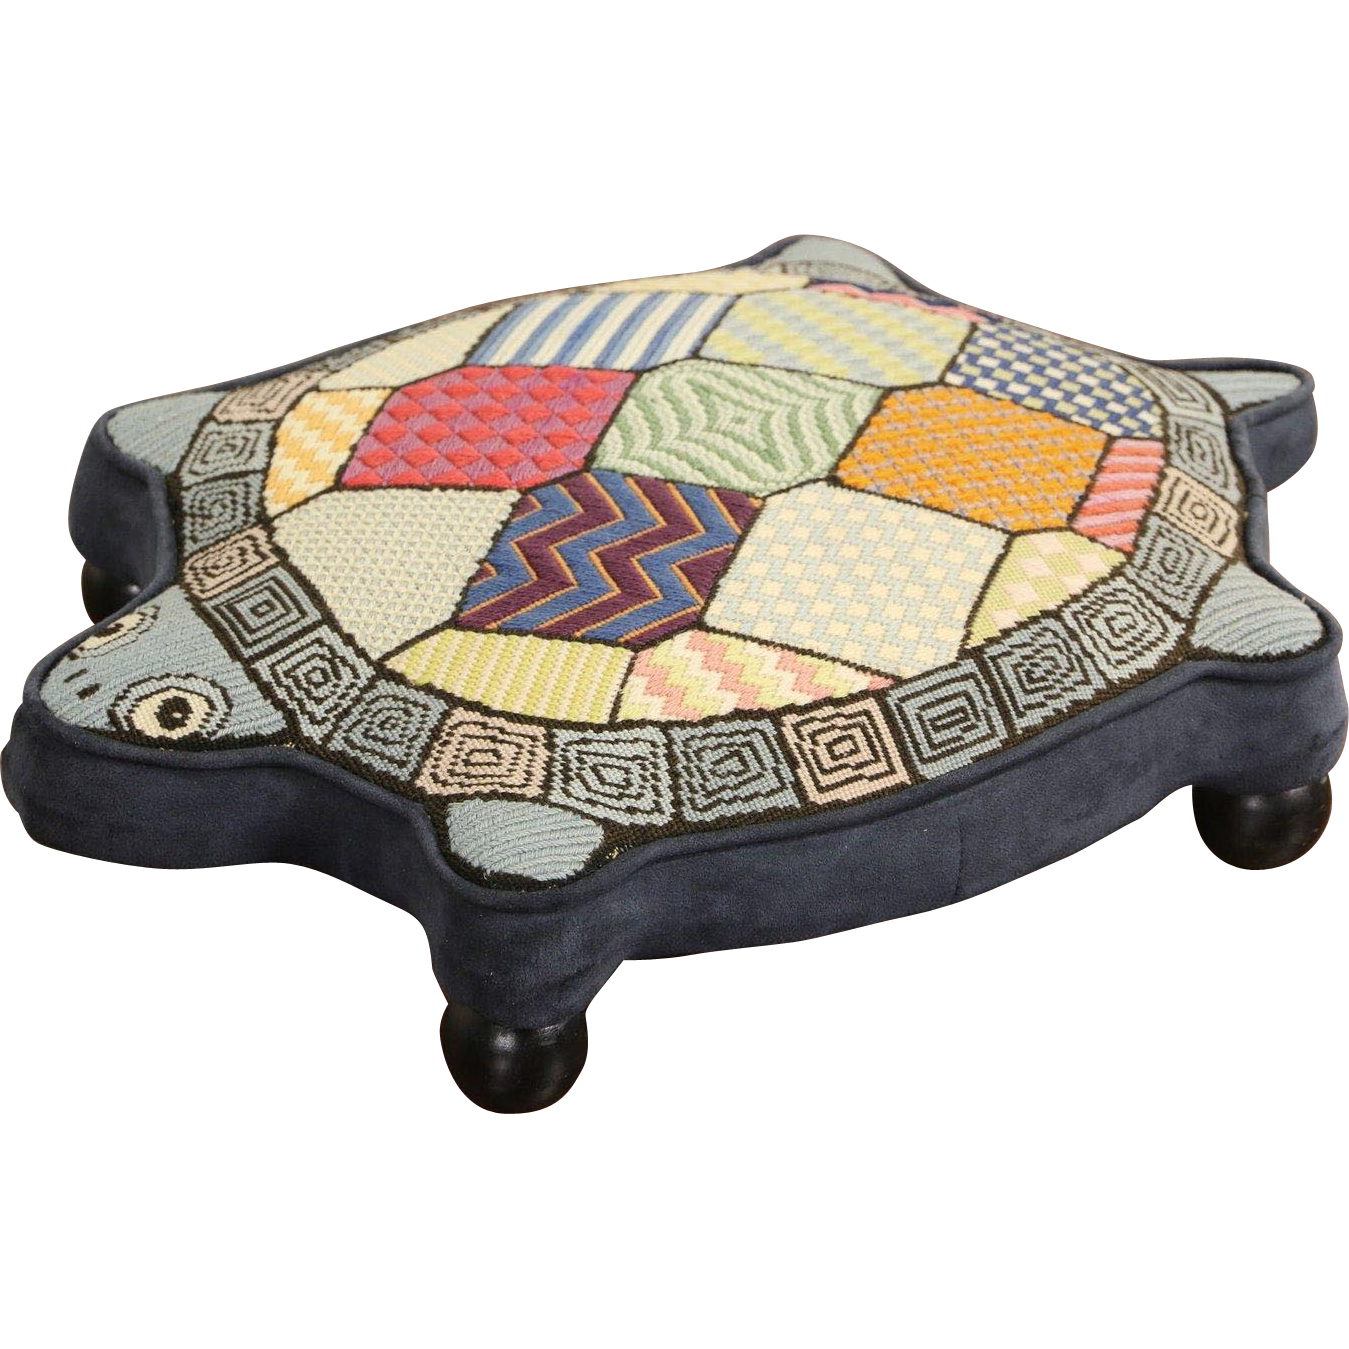 Turtle  Foot Stool, Vintage Hand Stitched Needlepoint & Velvet